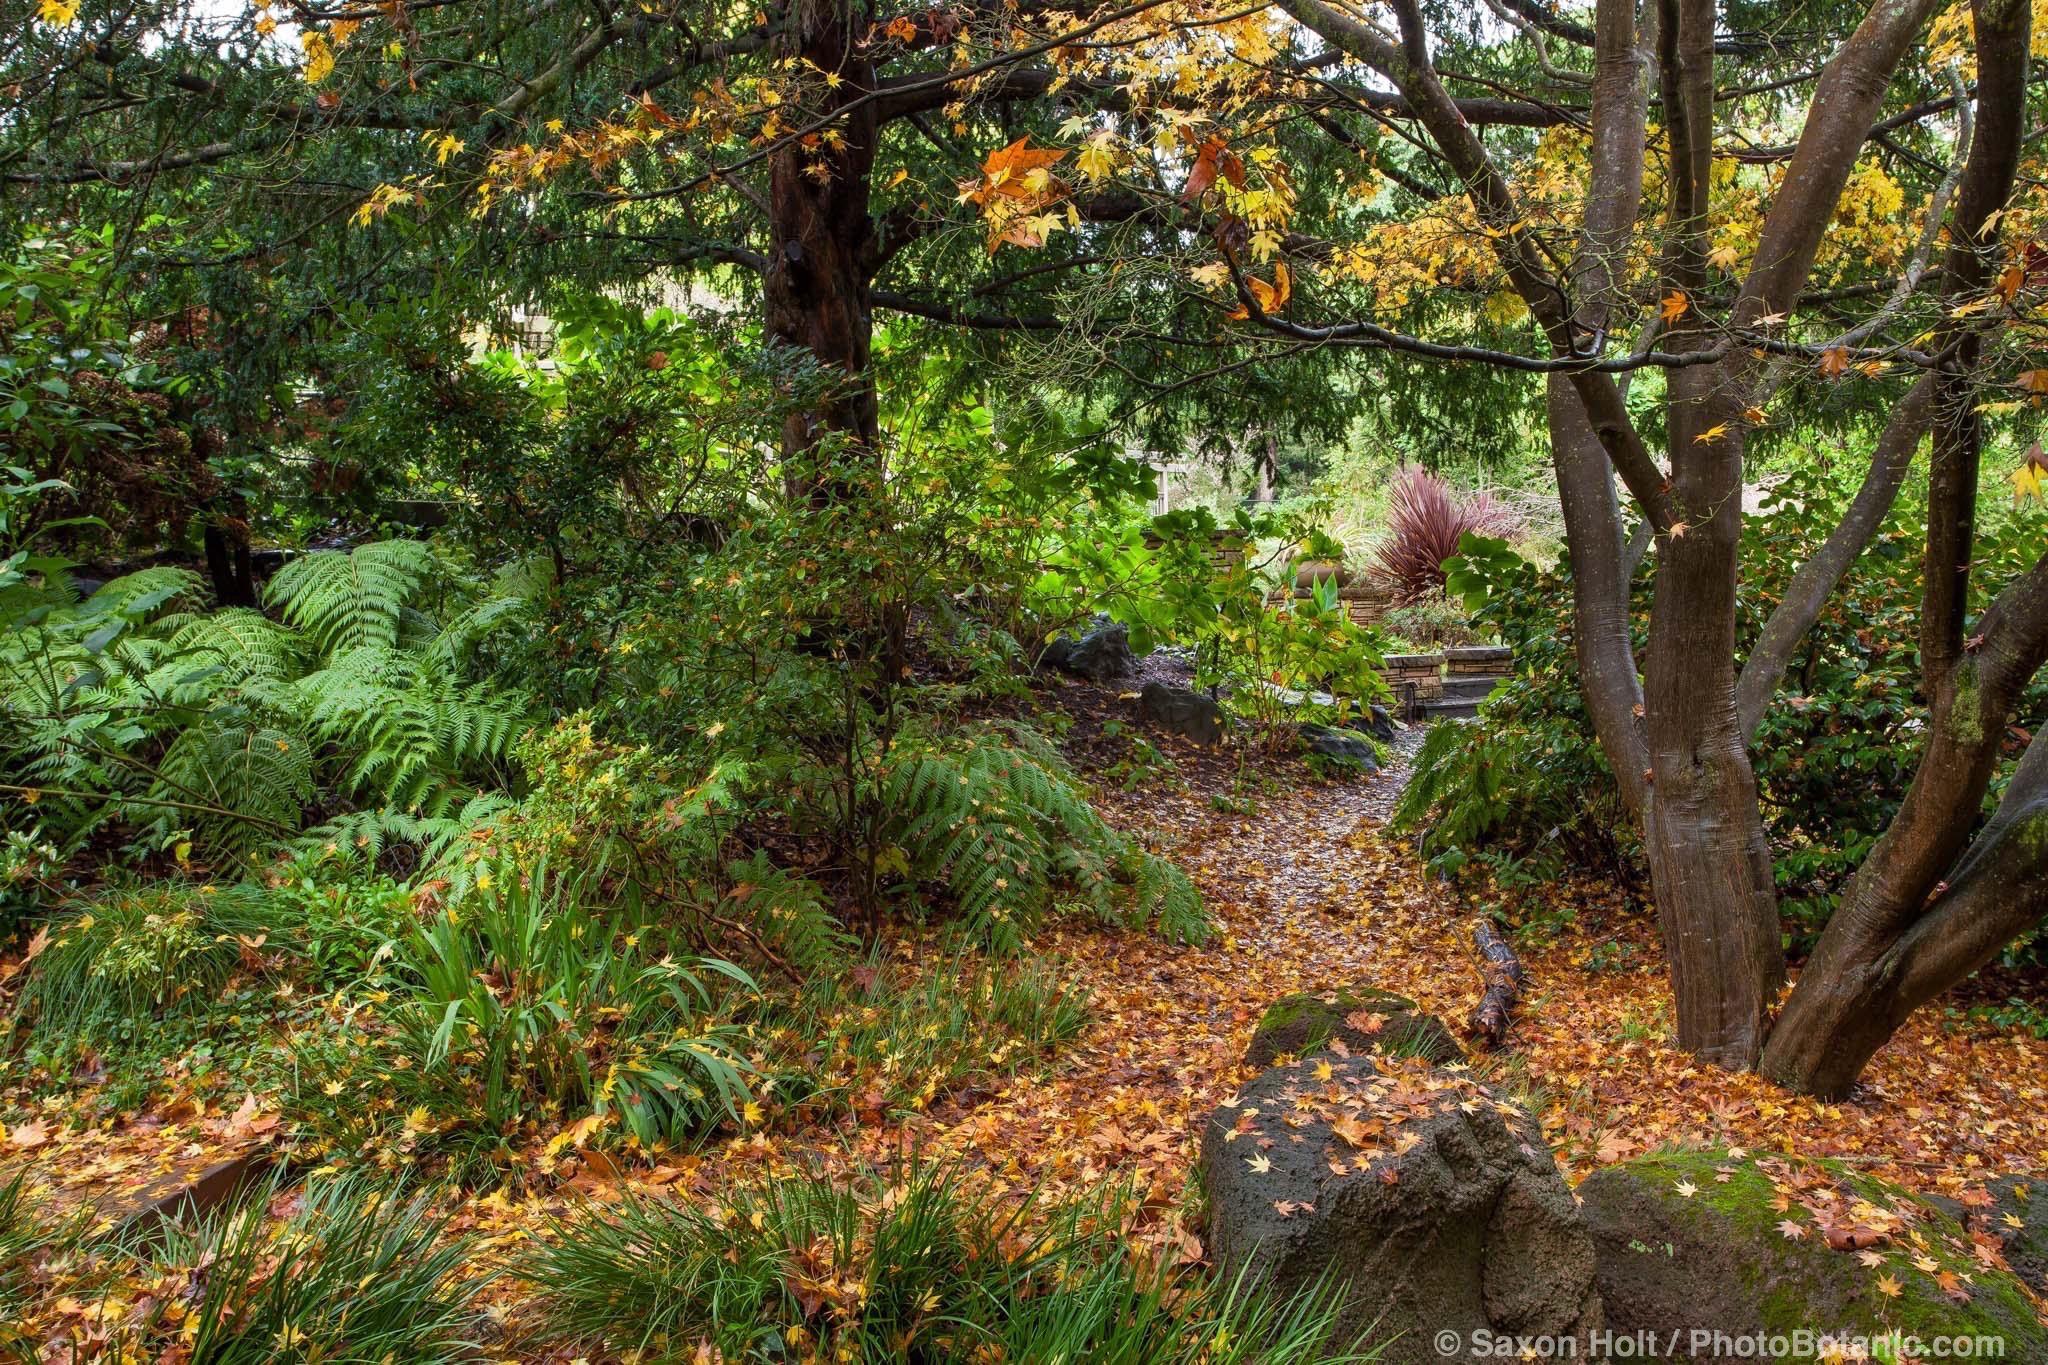 Acer palmatum, Japanese Maple tree autumn leaves on path among ferns in San Francisco Botanical Garden